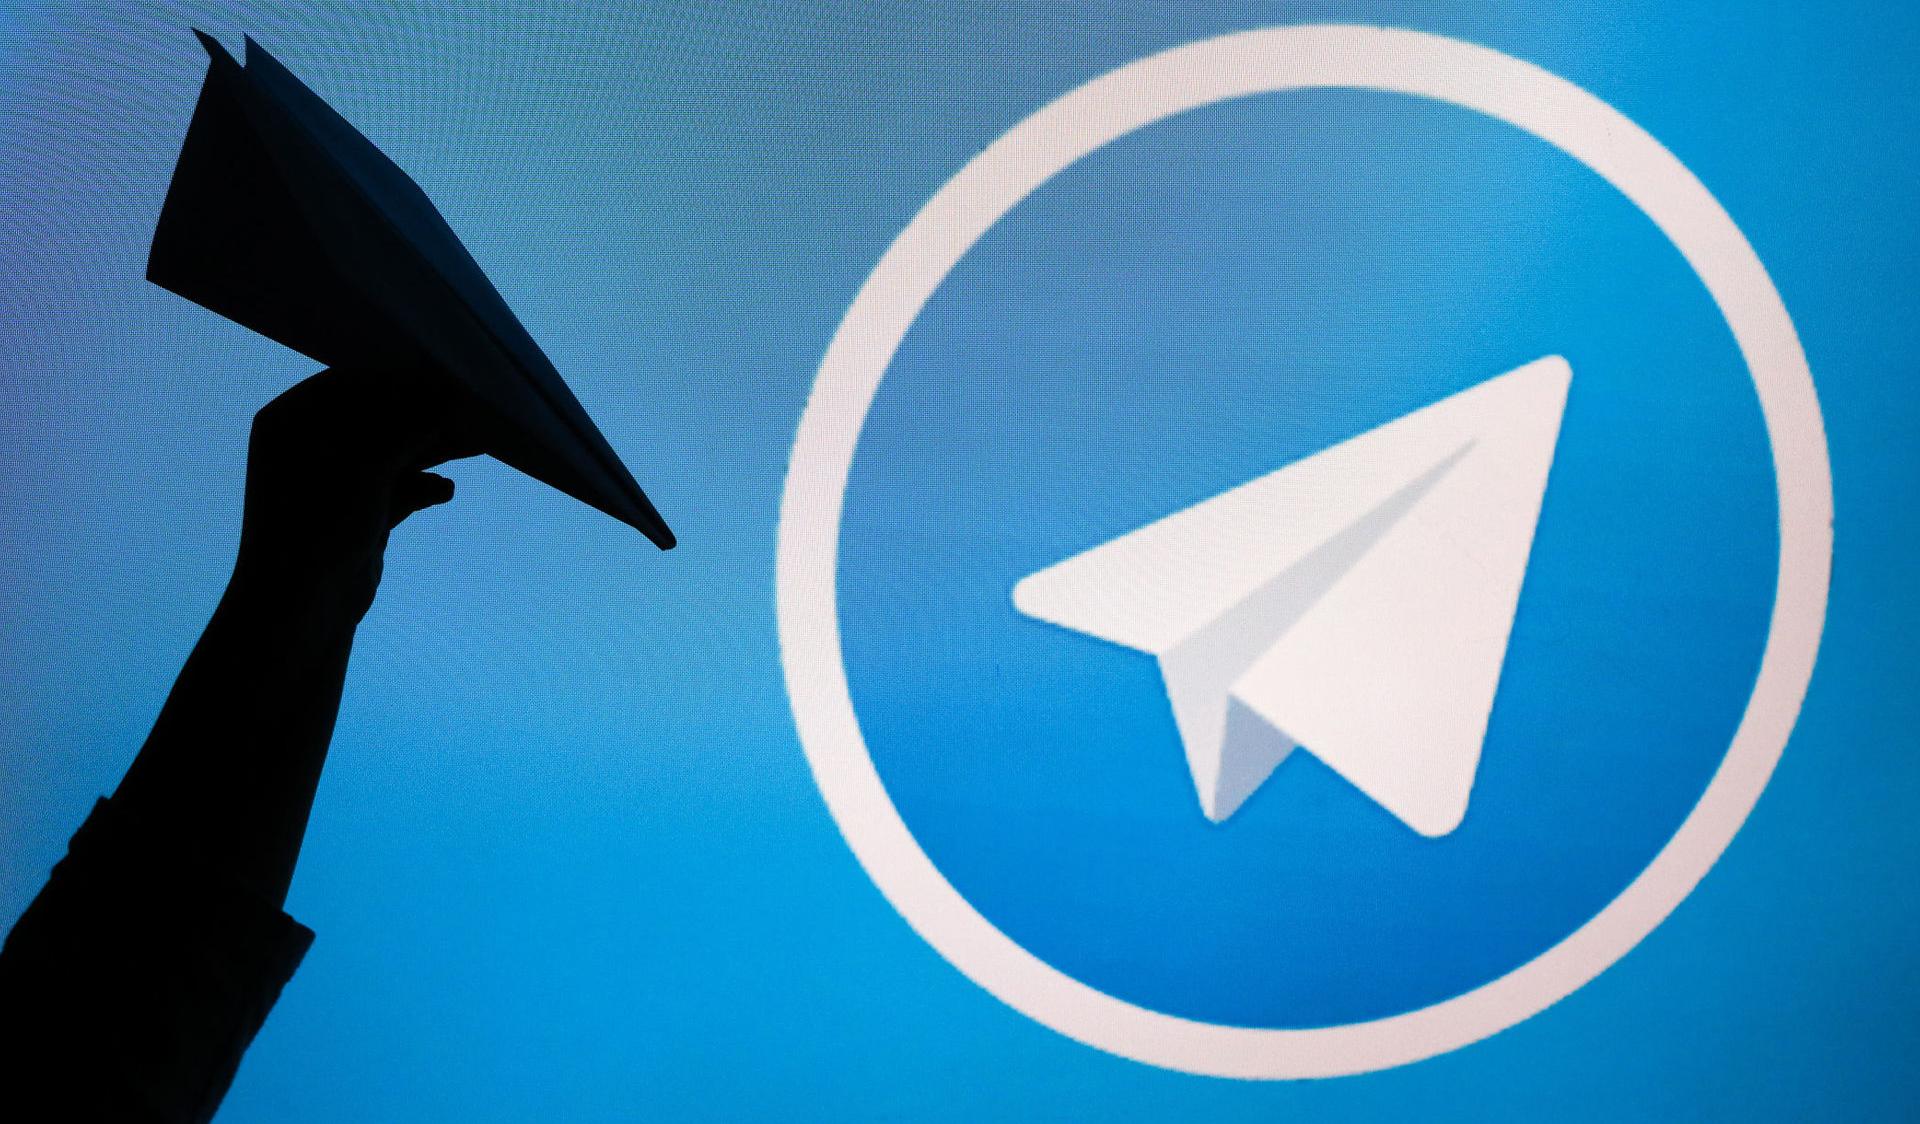 Павел Дуров закрывает Telegram